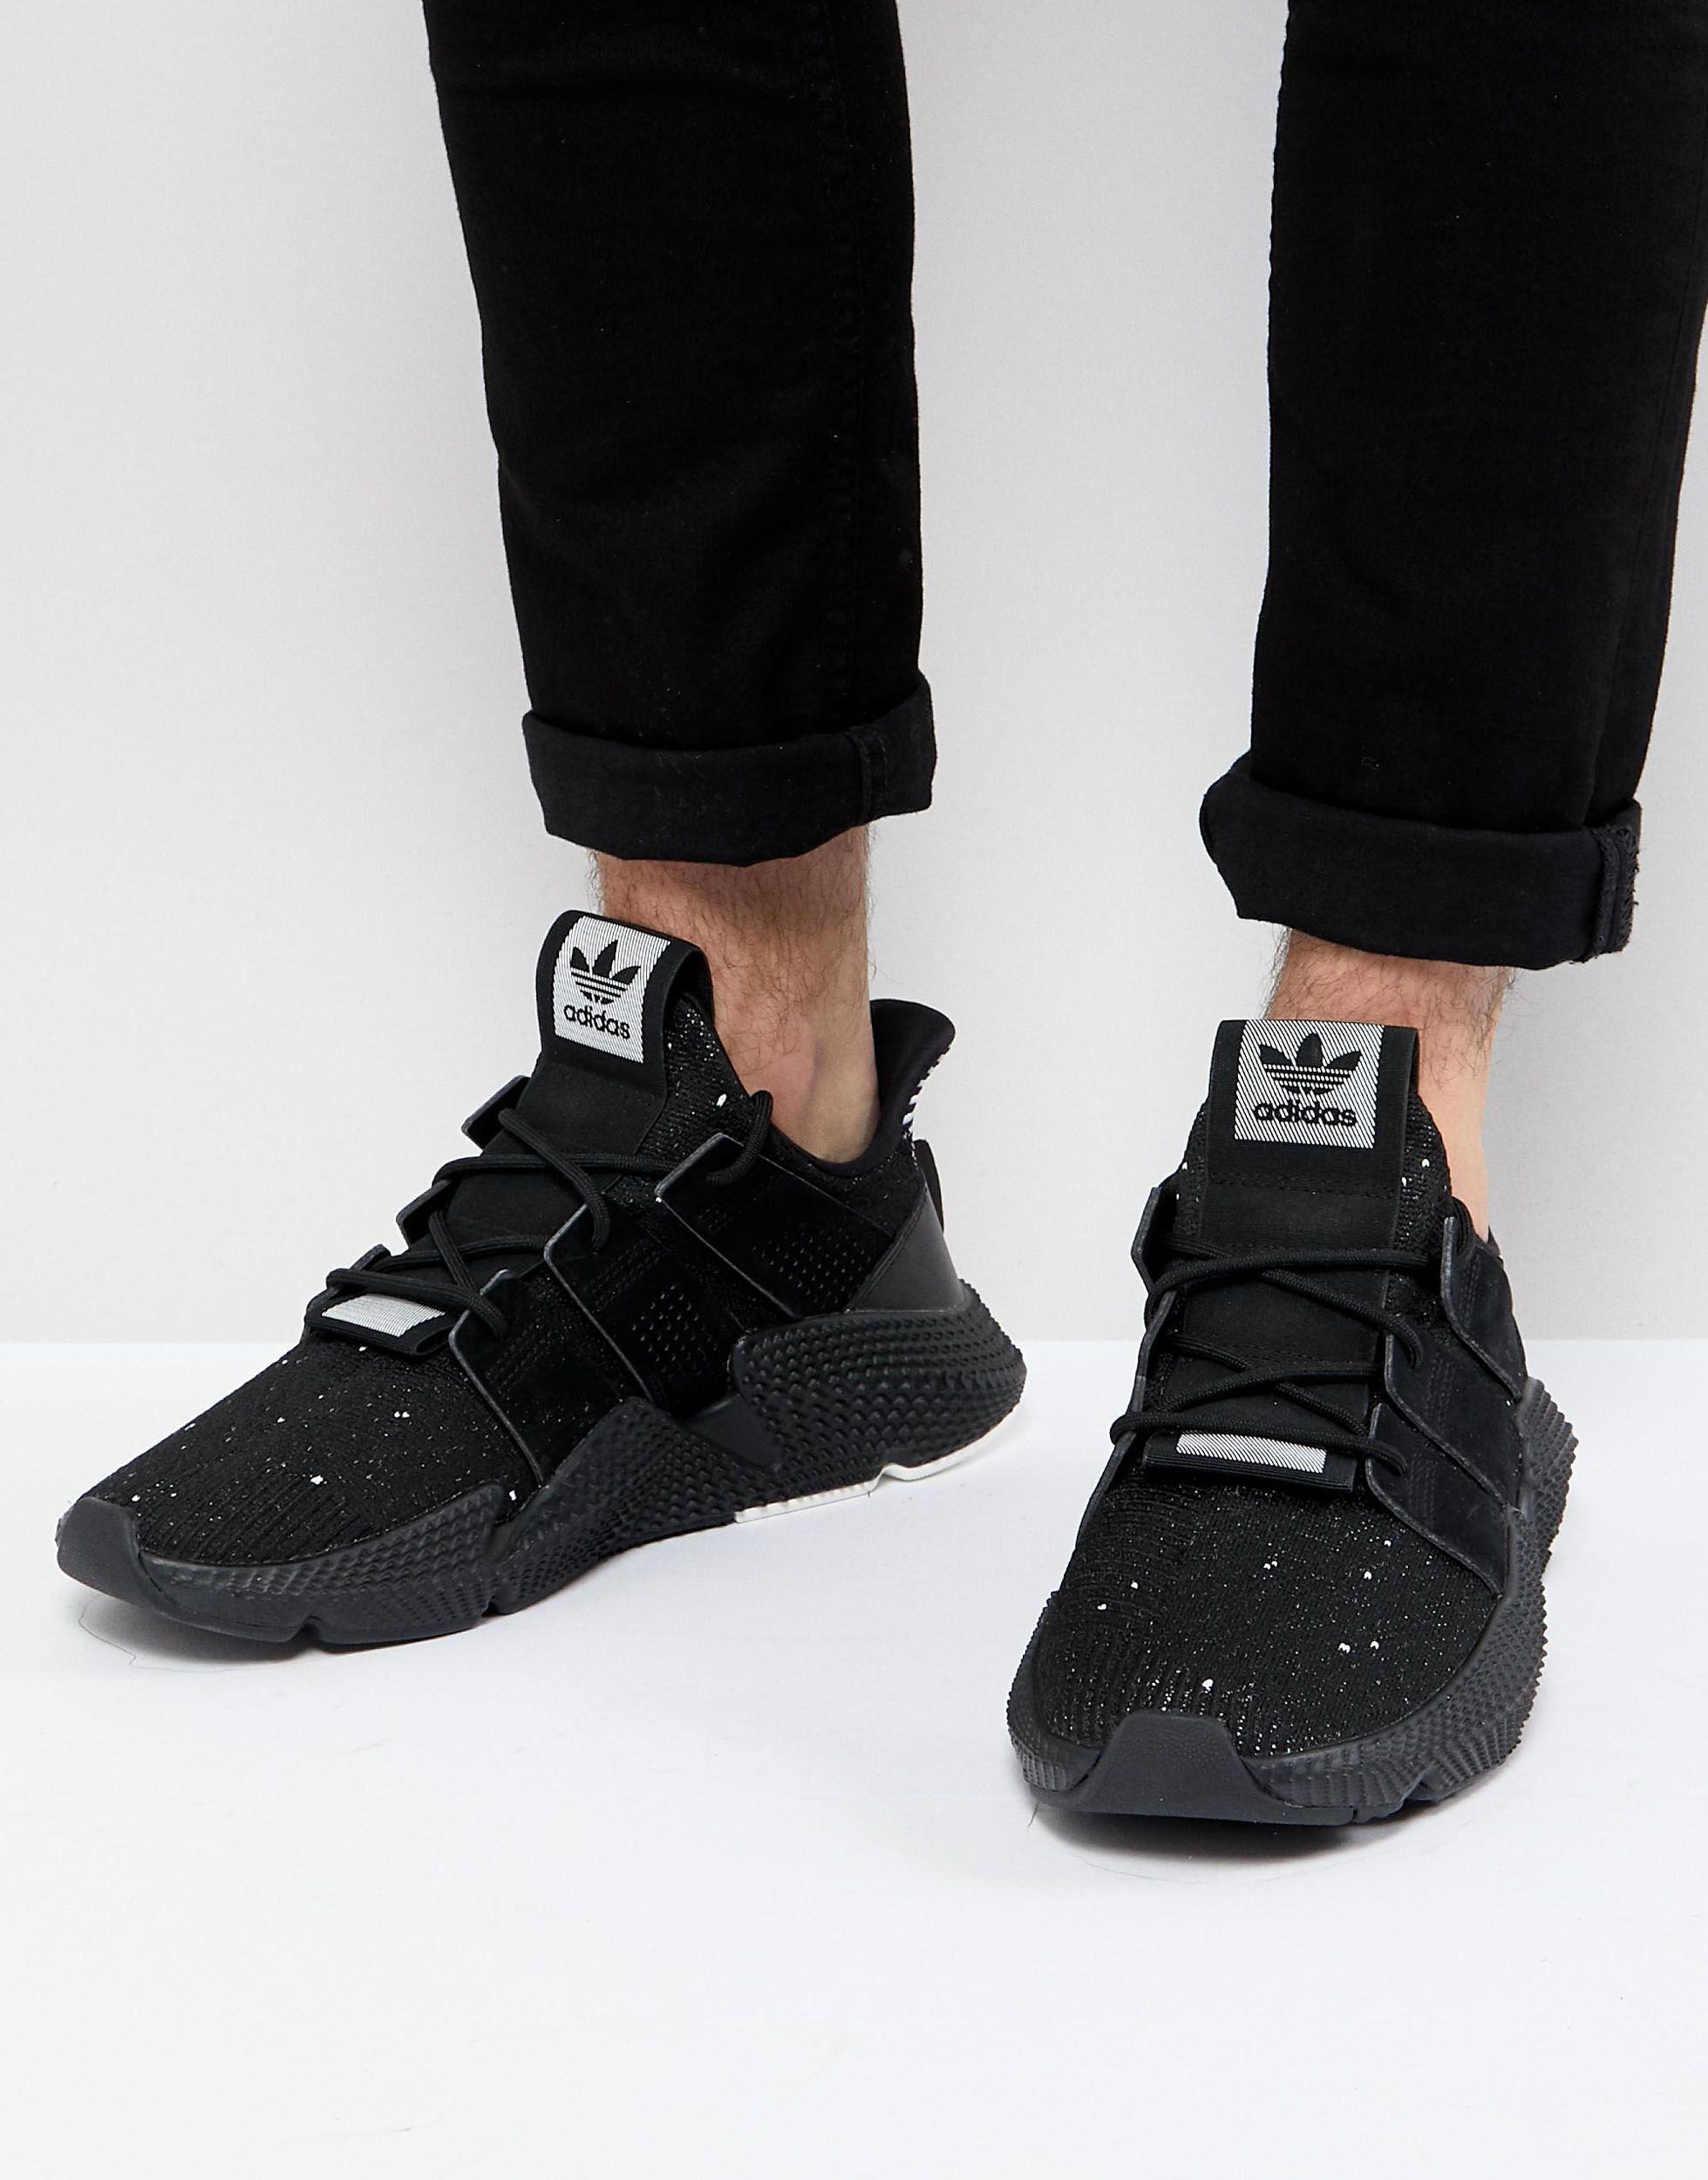 adidas Originals Prophere Sneakers in Black for Men - Lyst